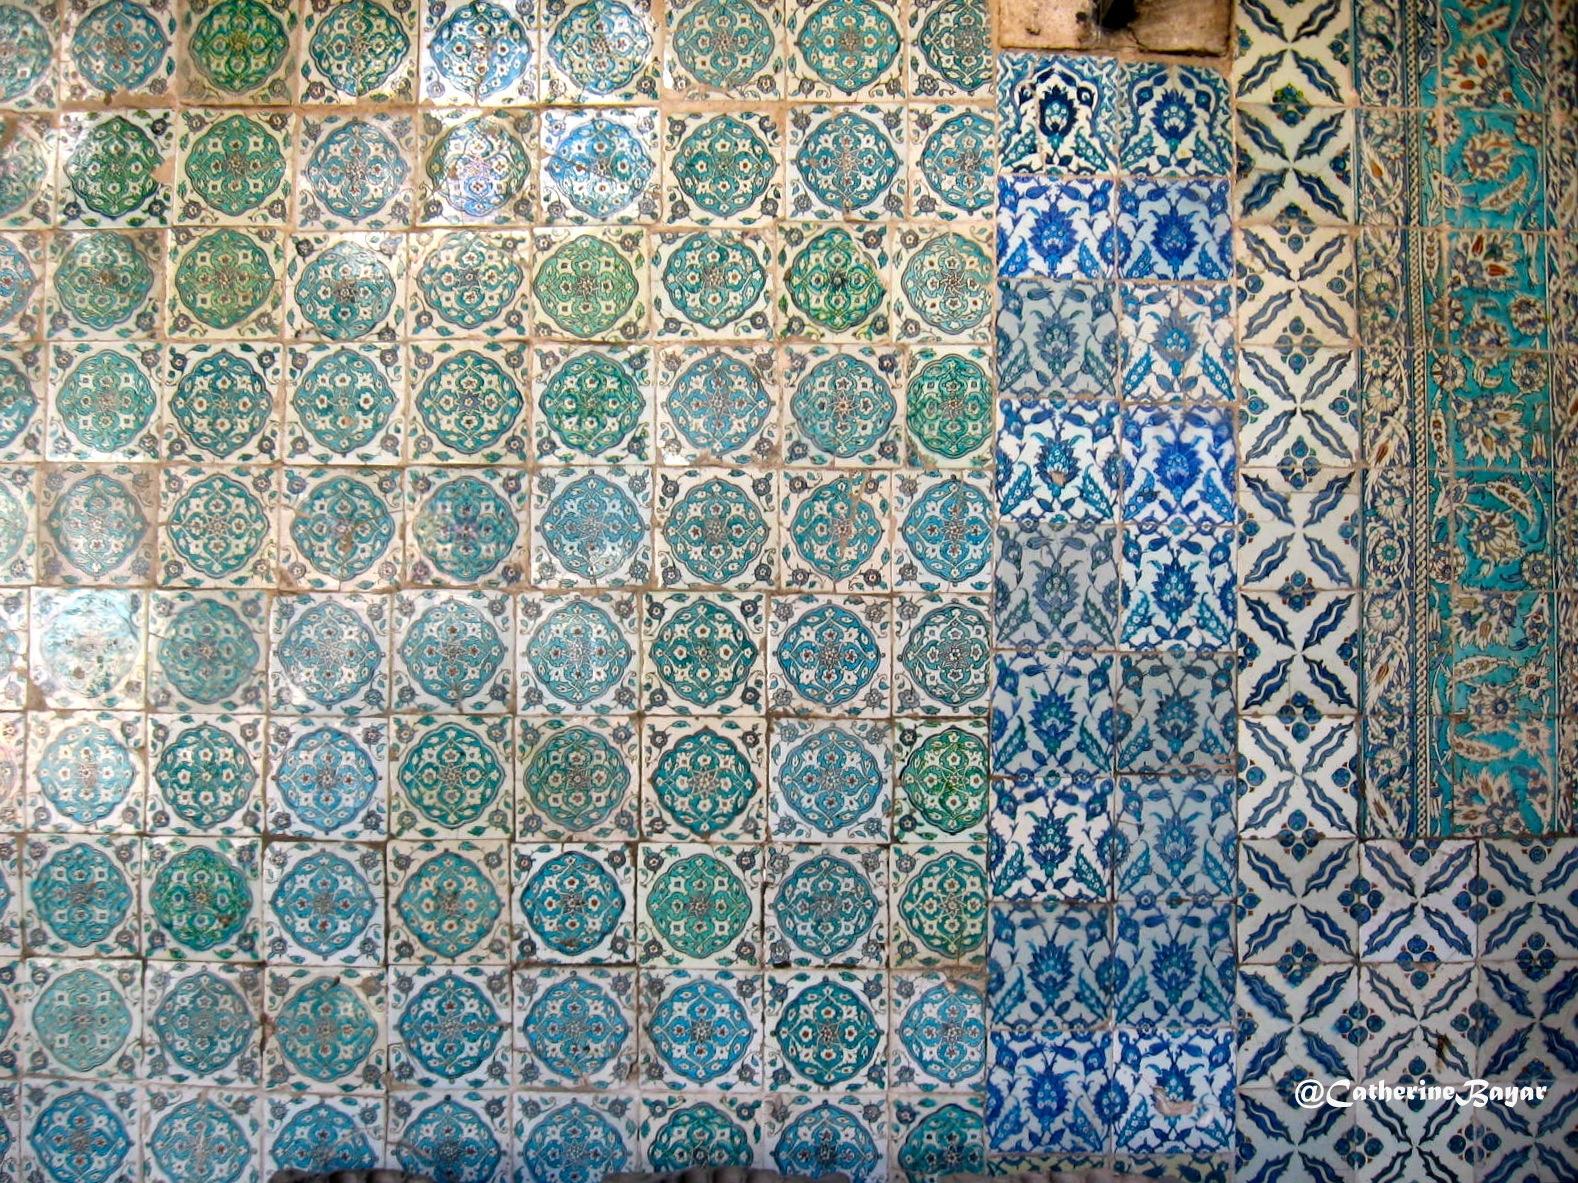 Mosaic Tile As Interior Elements : Mosaic Tile As Interior Elements » Home Design 2017